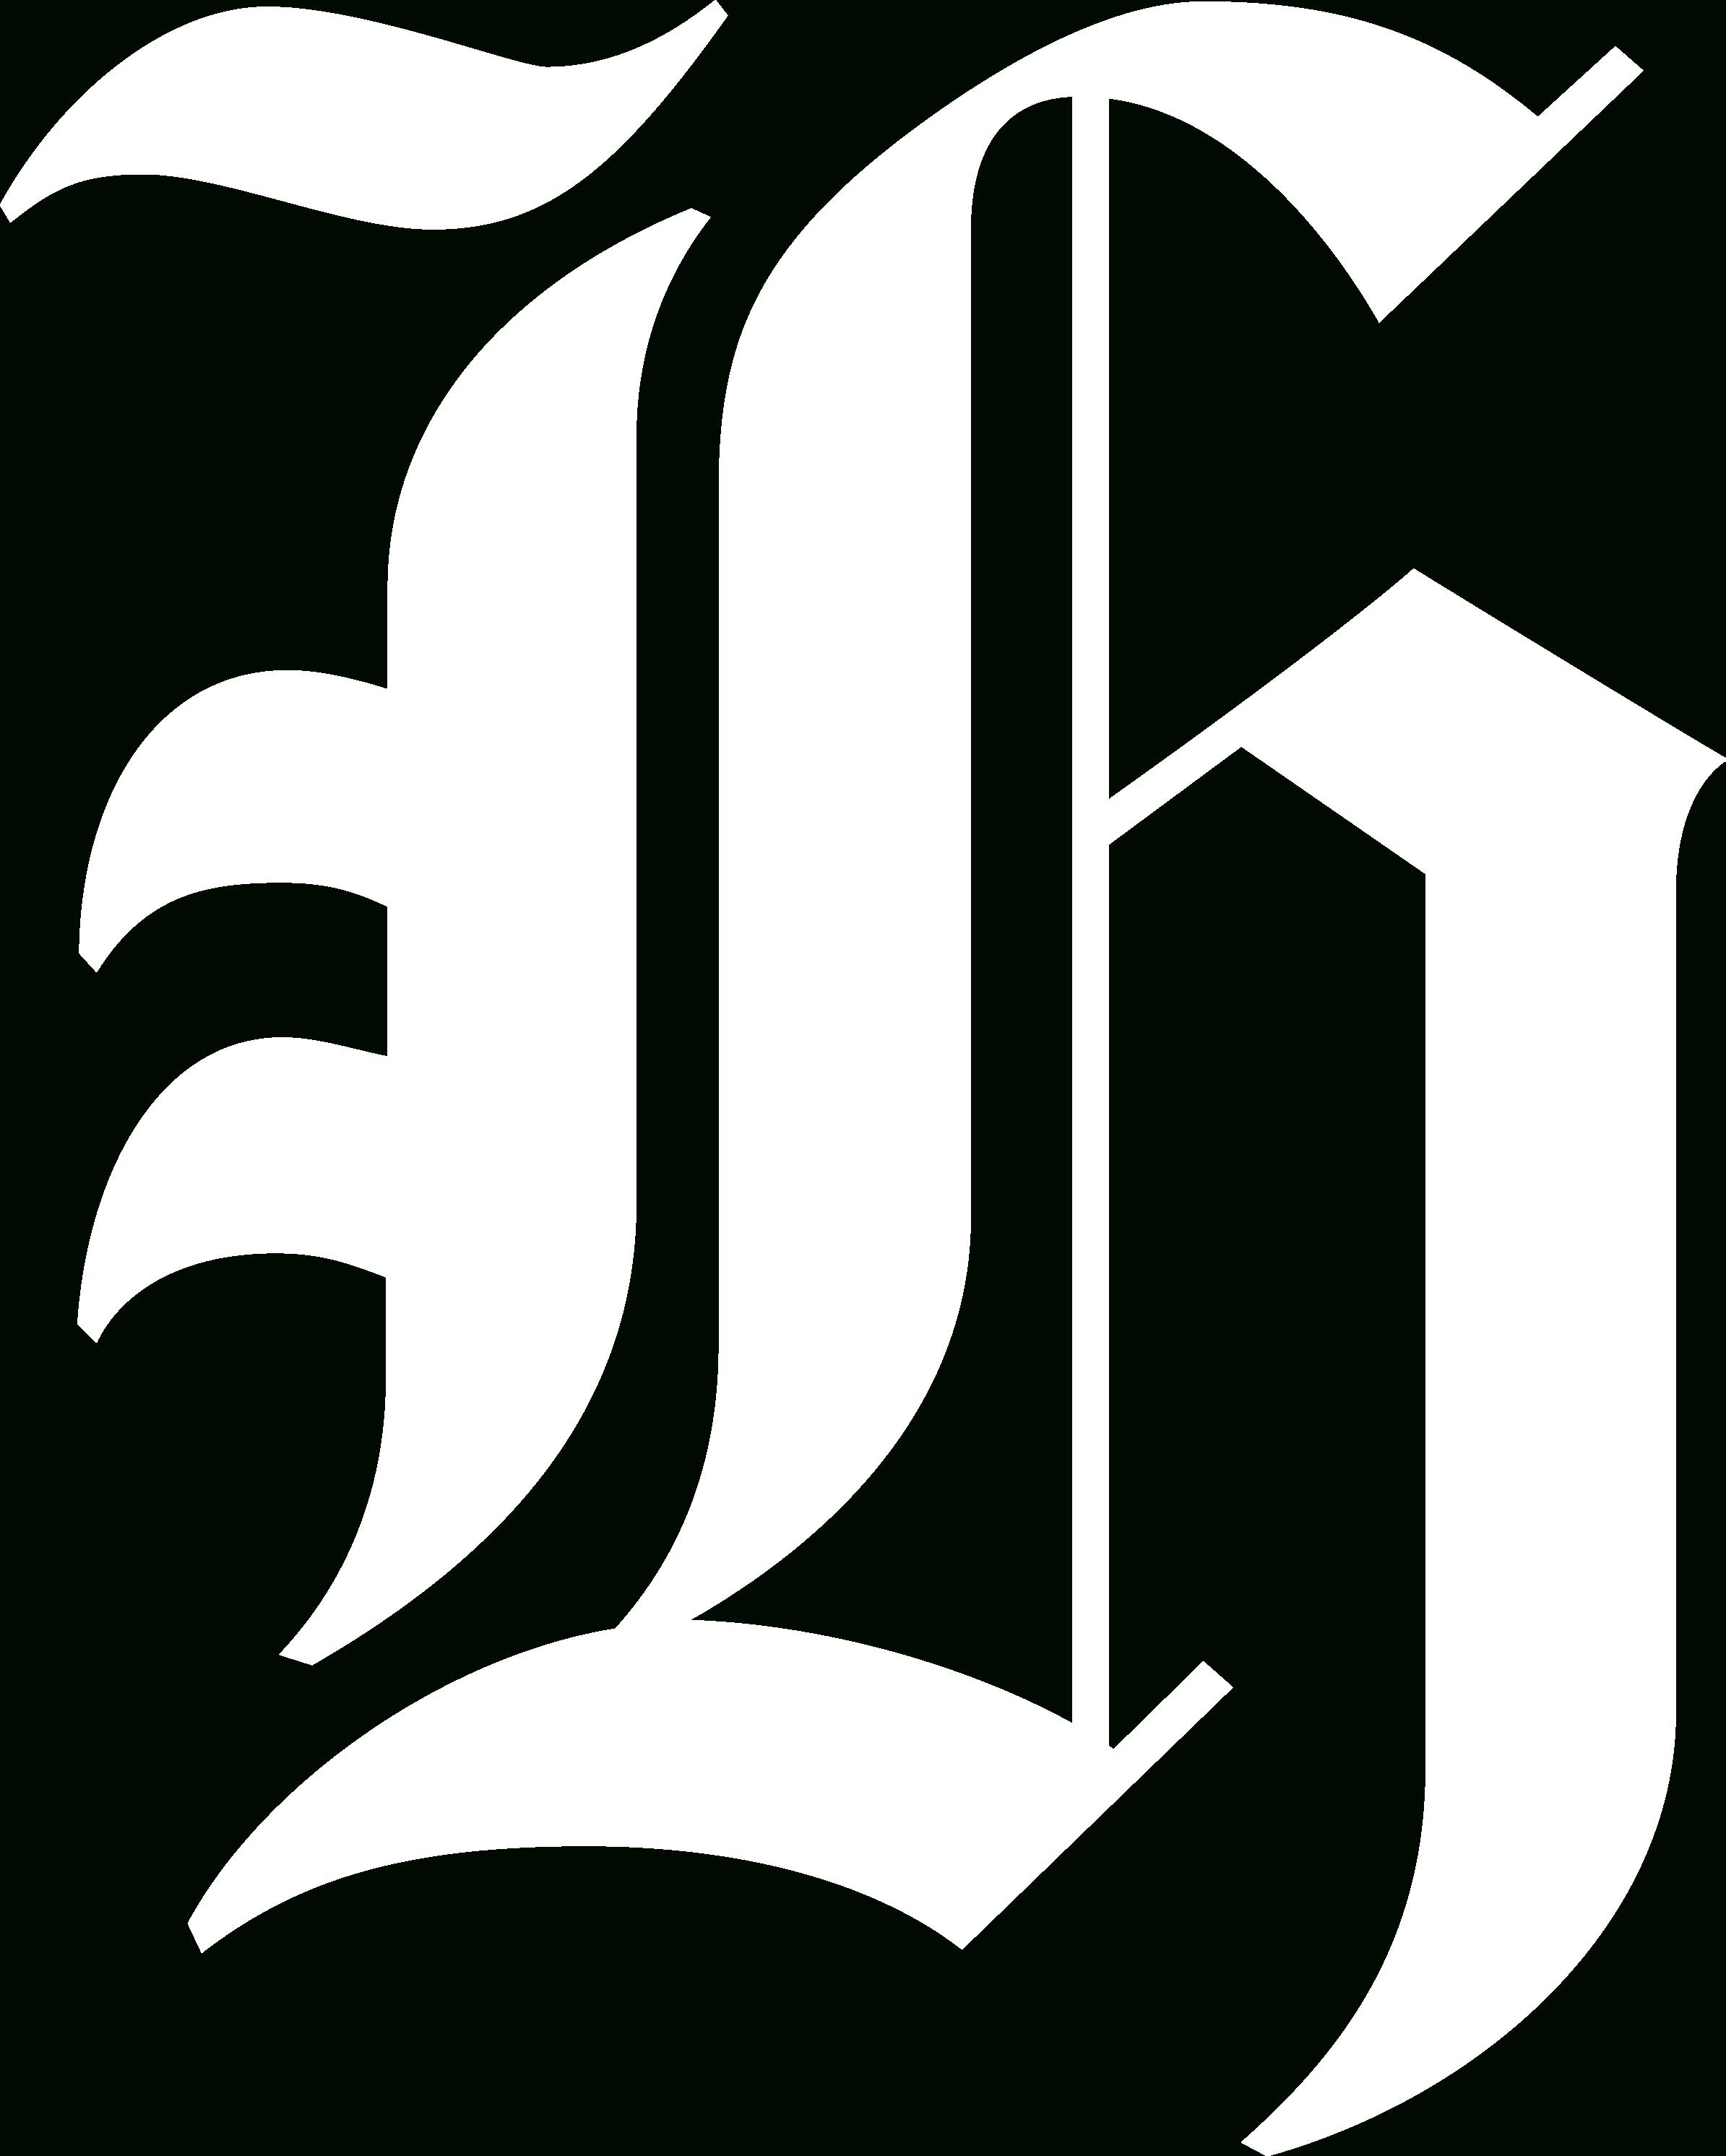 Crossword Puzzles - Nz Herald - Printable Cryptic Crossword Puzzles Nz